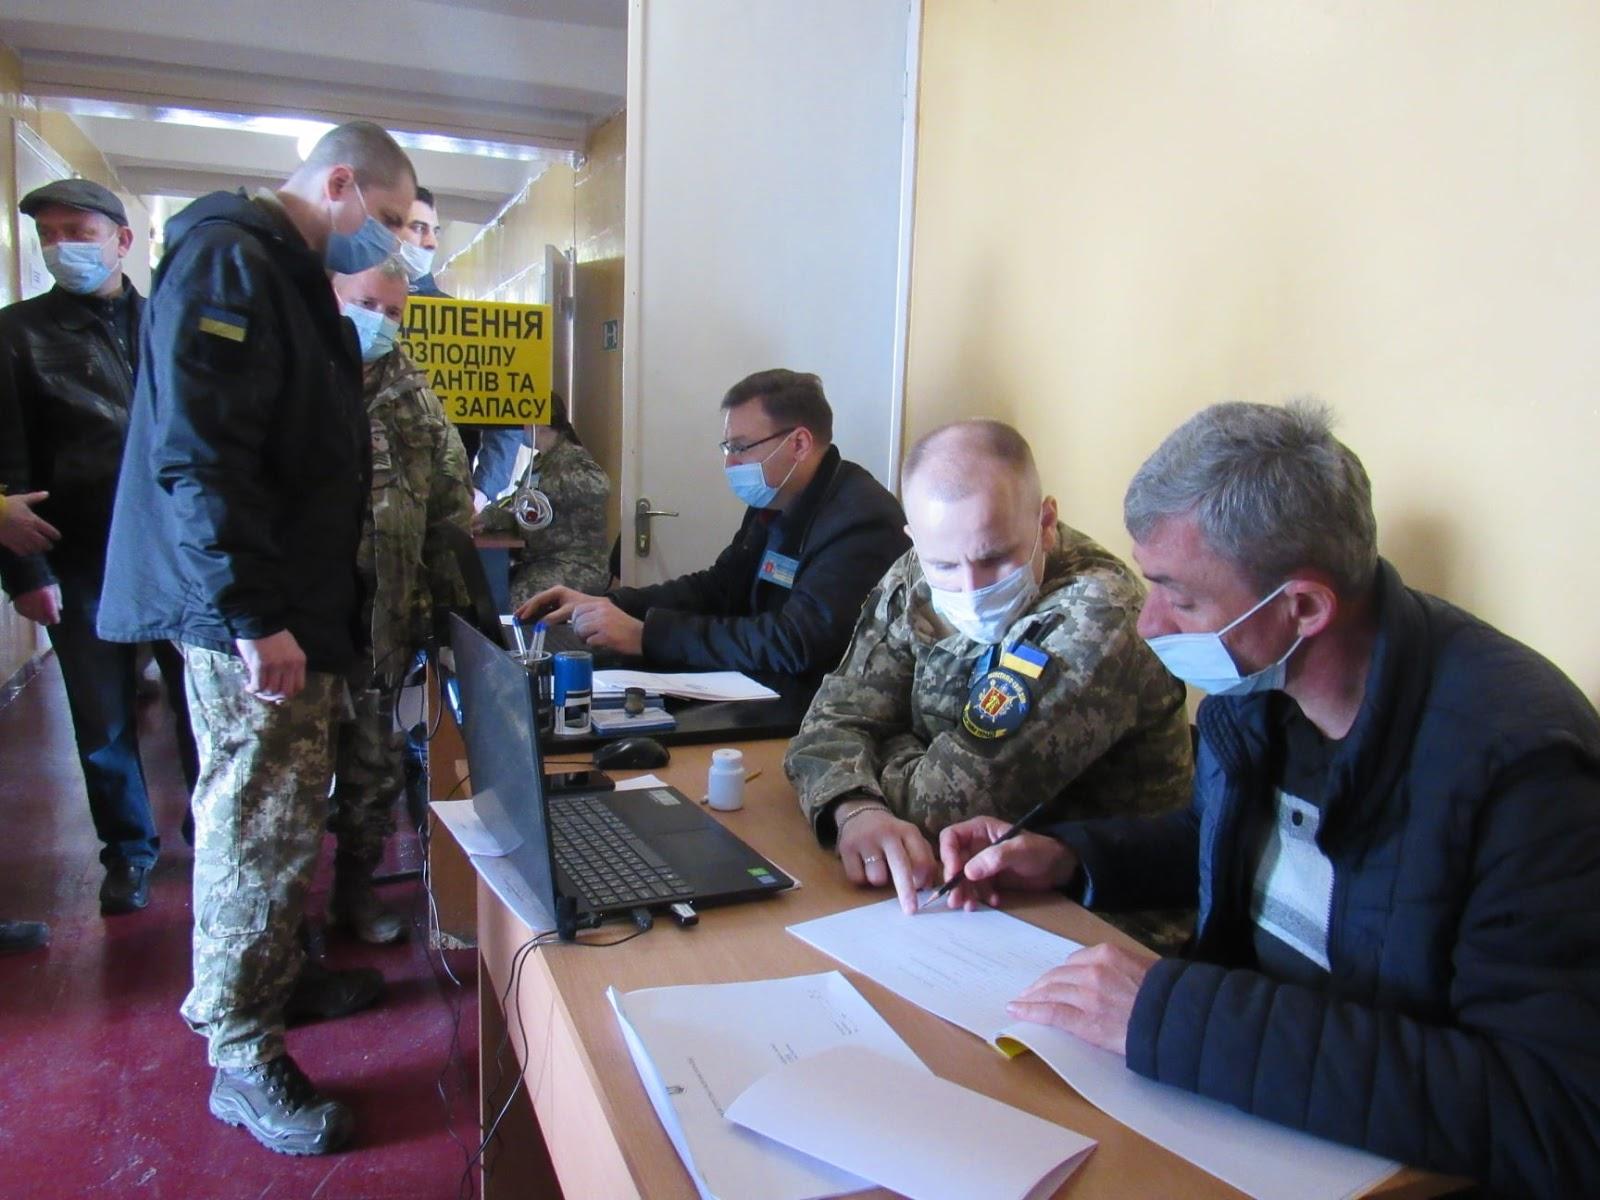 110-та та 124-та бригади тероборони розпочали збори